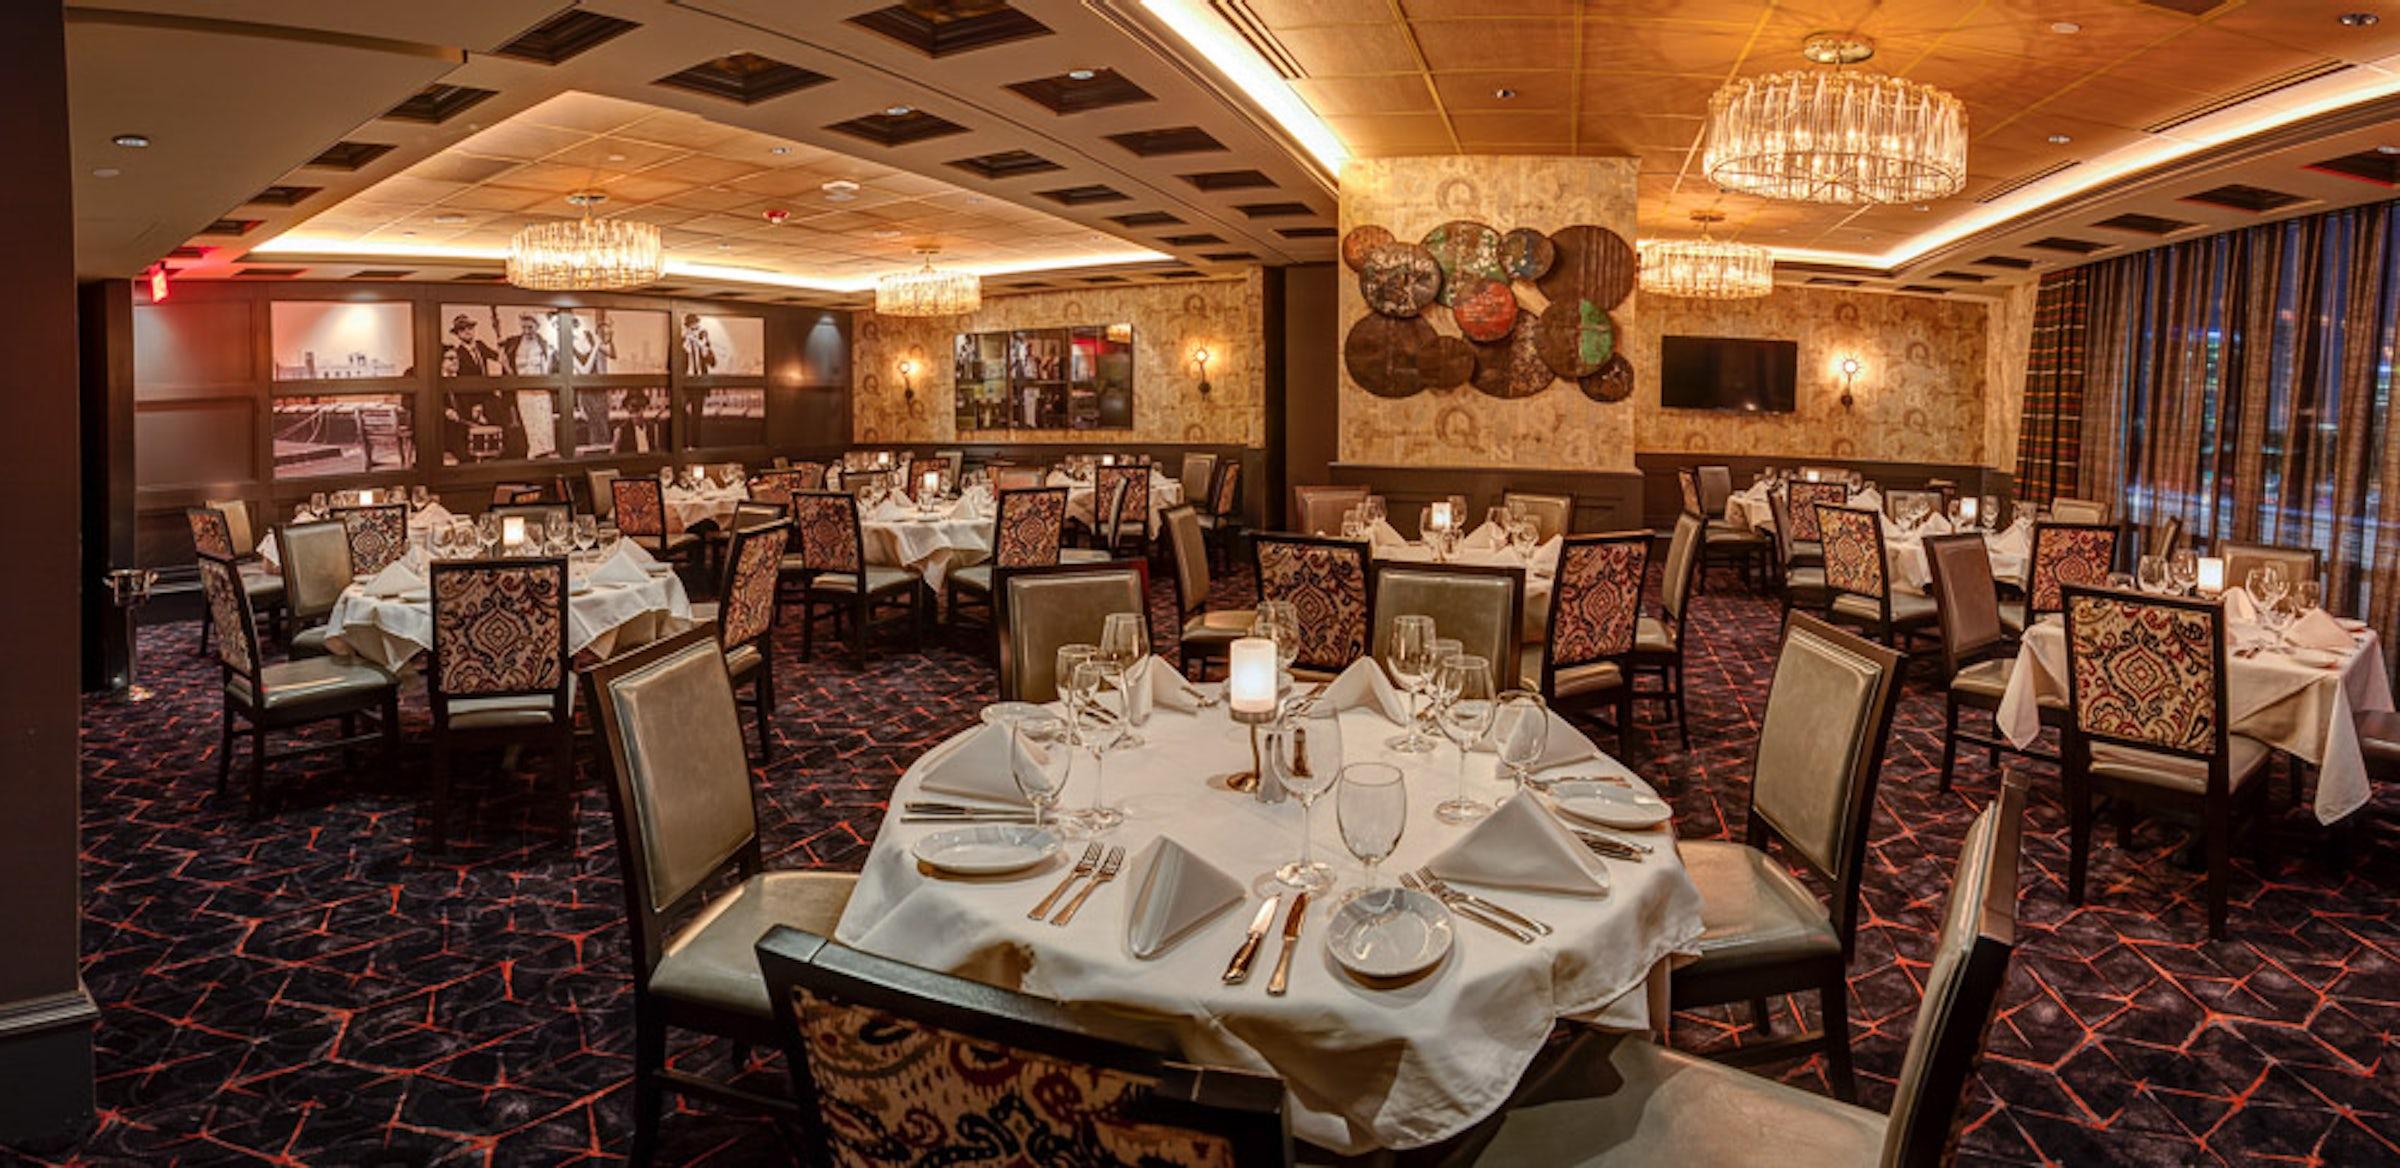 Ruth's Chris Steak House Dallas-Uptown in Beyond Dallas